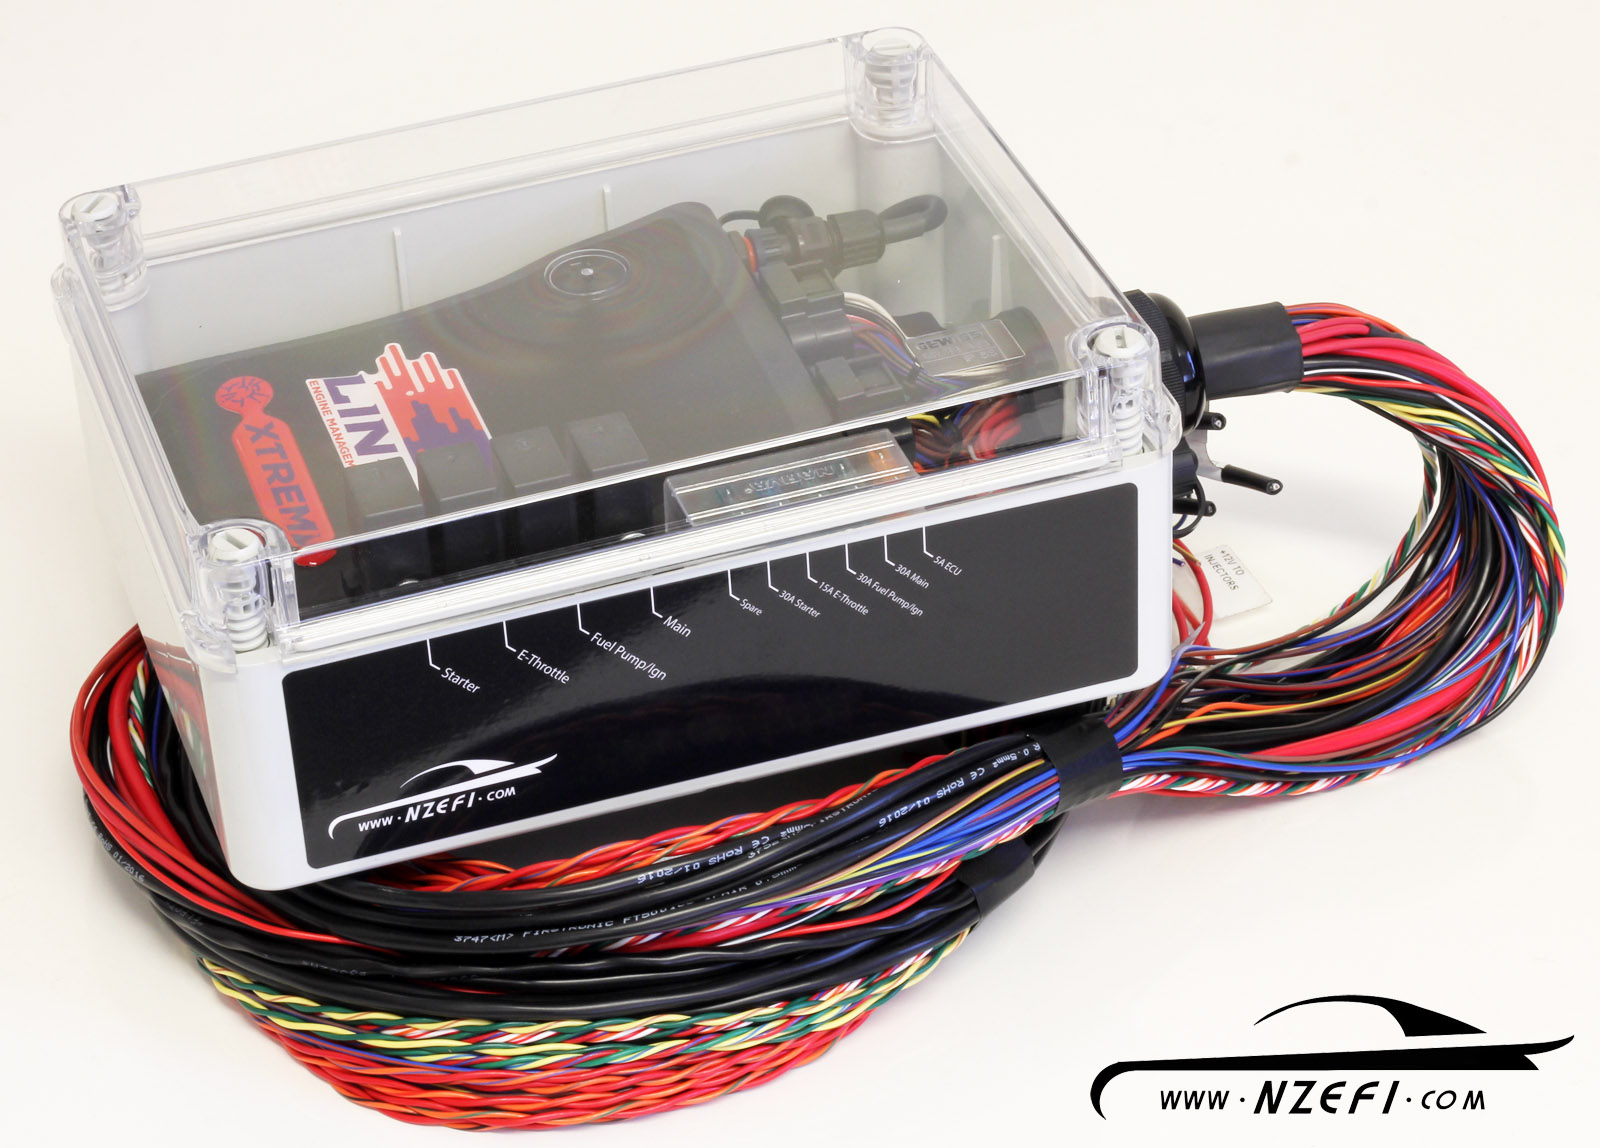 nzefi link g4 68 pin ecu water resistant installation kit wt easy rh nzefi com wiring harness kit mazda cx9 wiring harness kits for harley